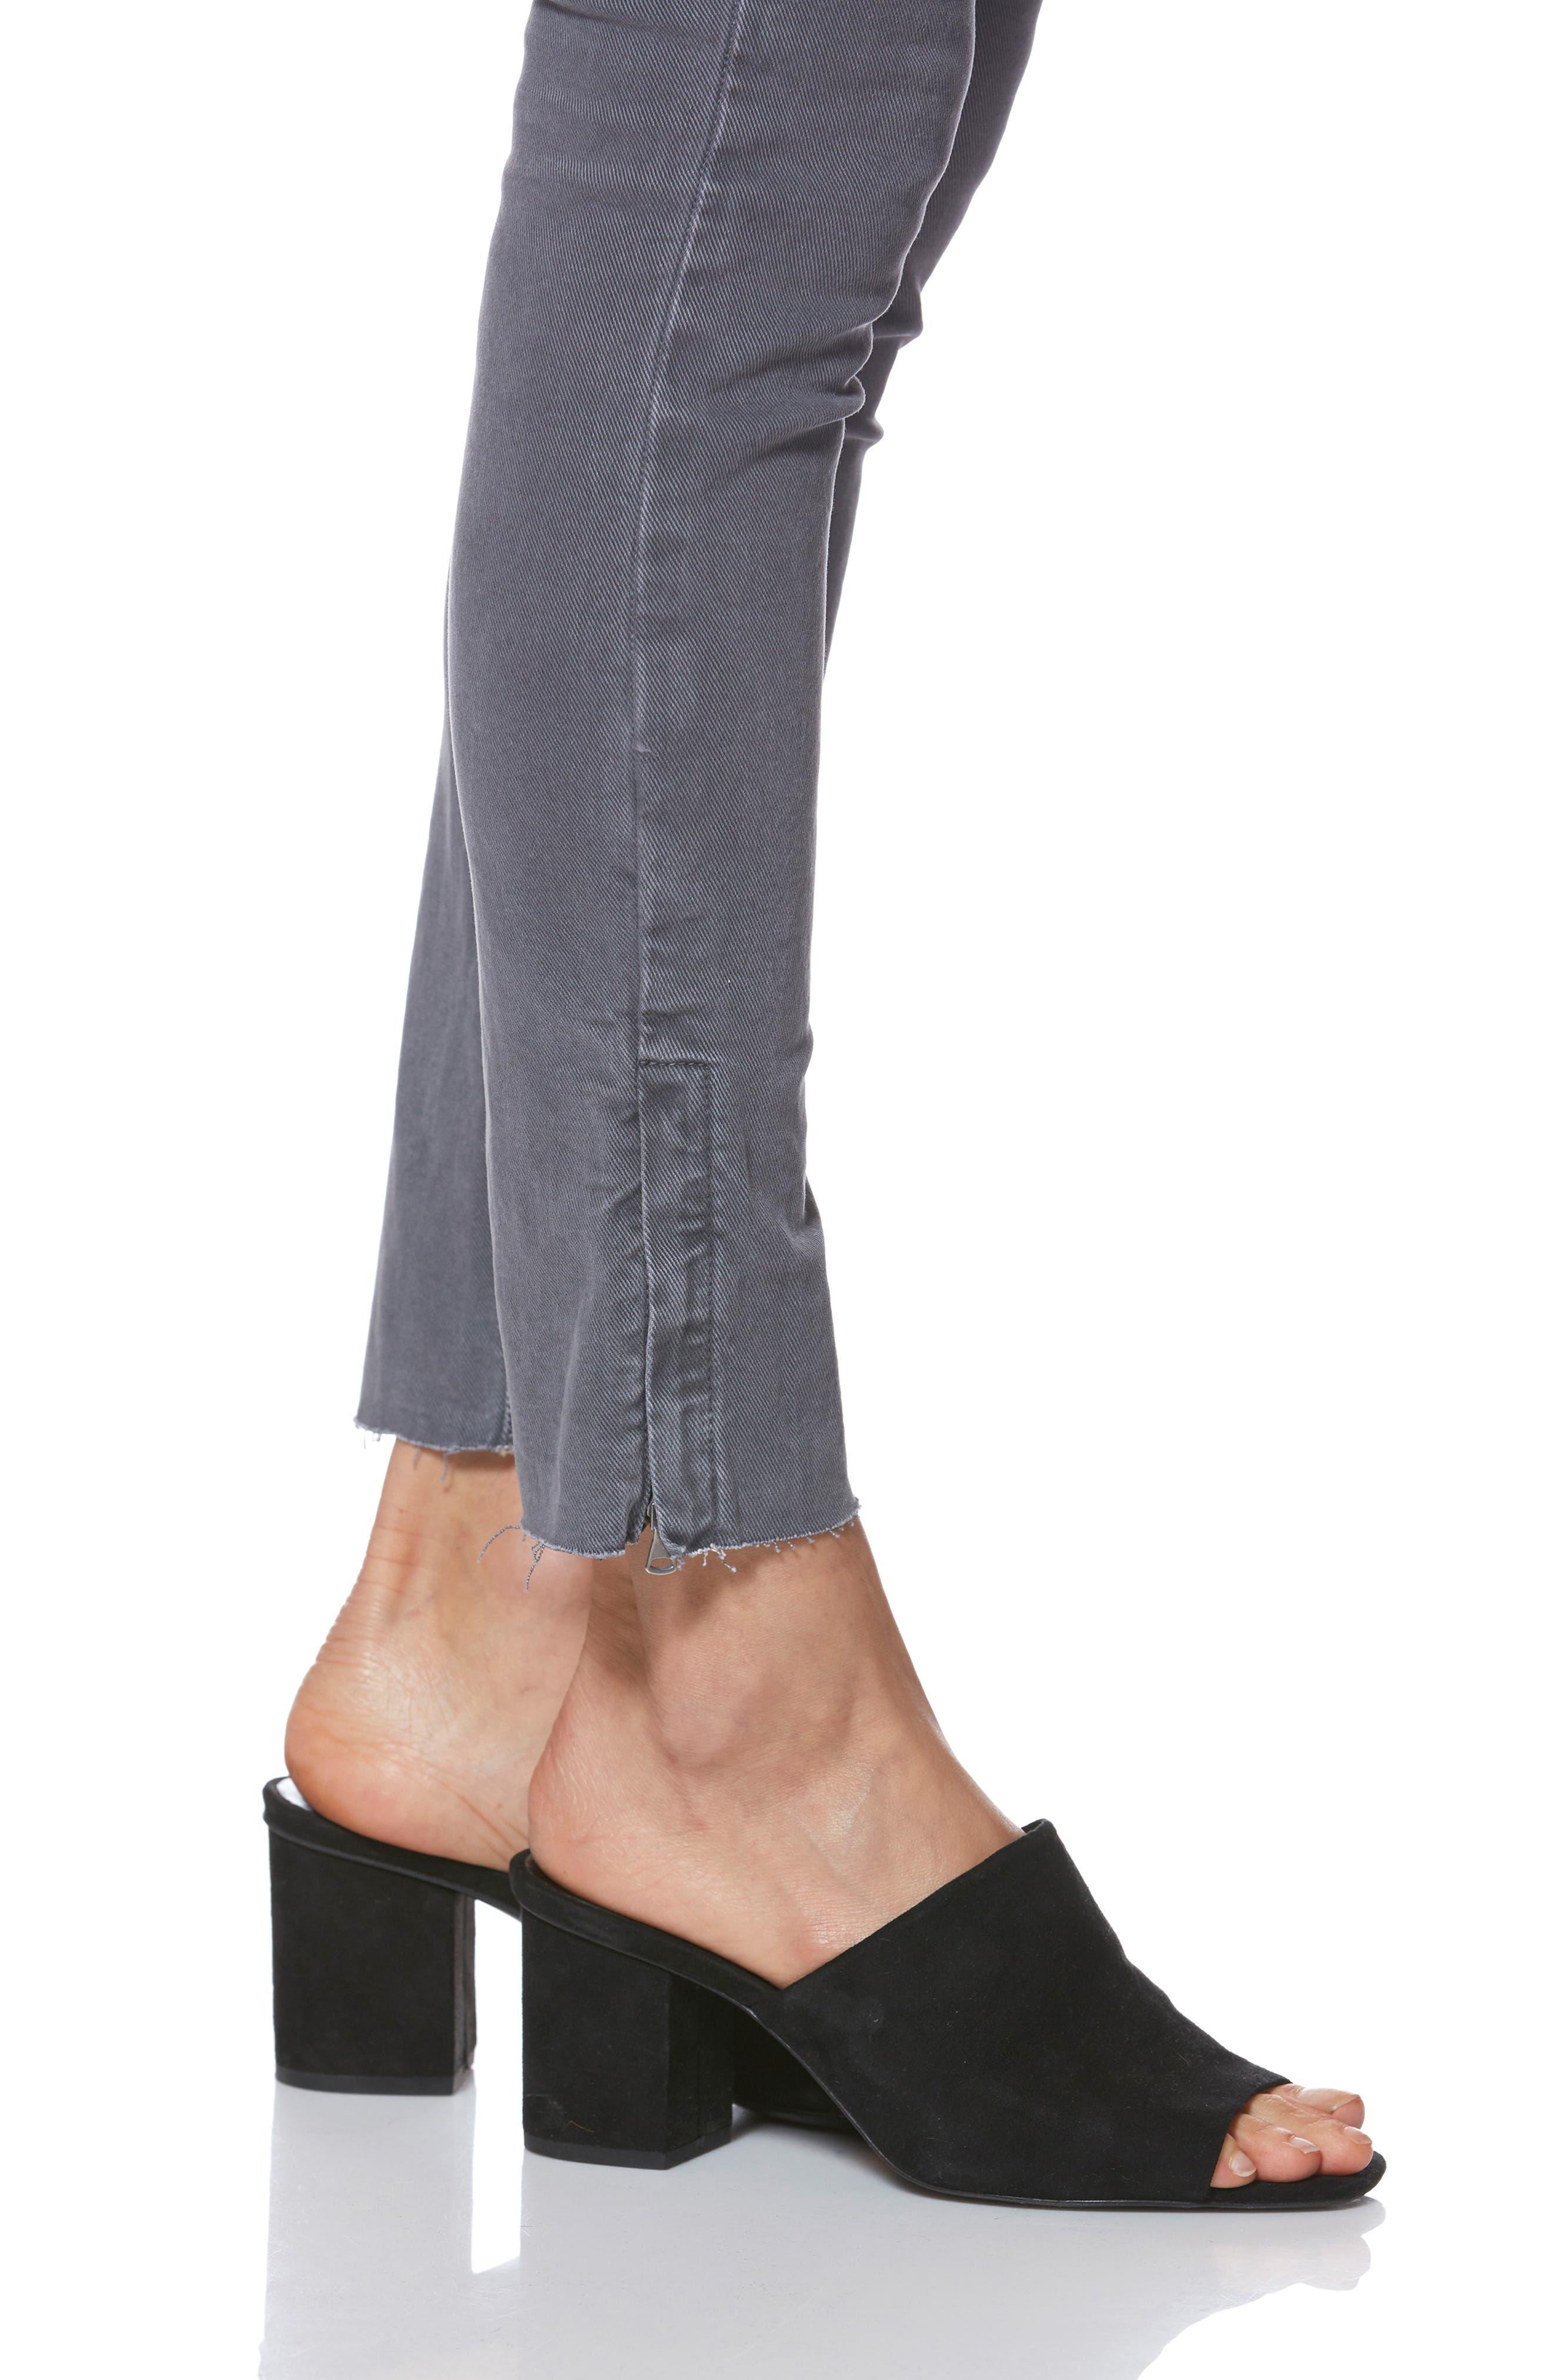 Hoxton Utilitarian High Waist Ankle Skinny Jeans,                             Alternate thumbnail 5, color,                             VINTAGE TORNADO